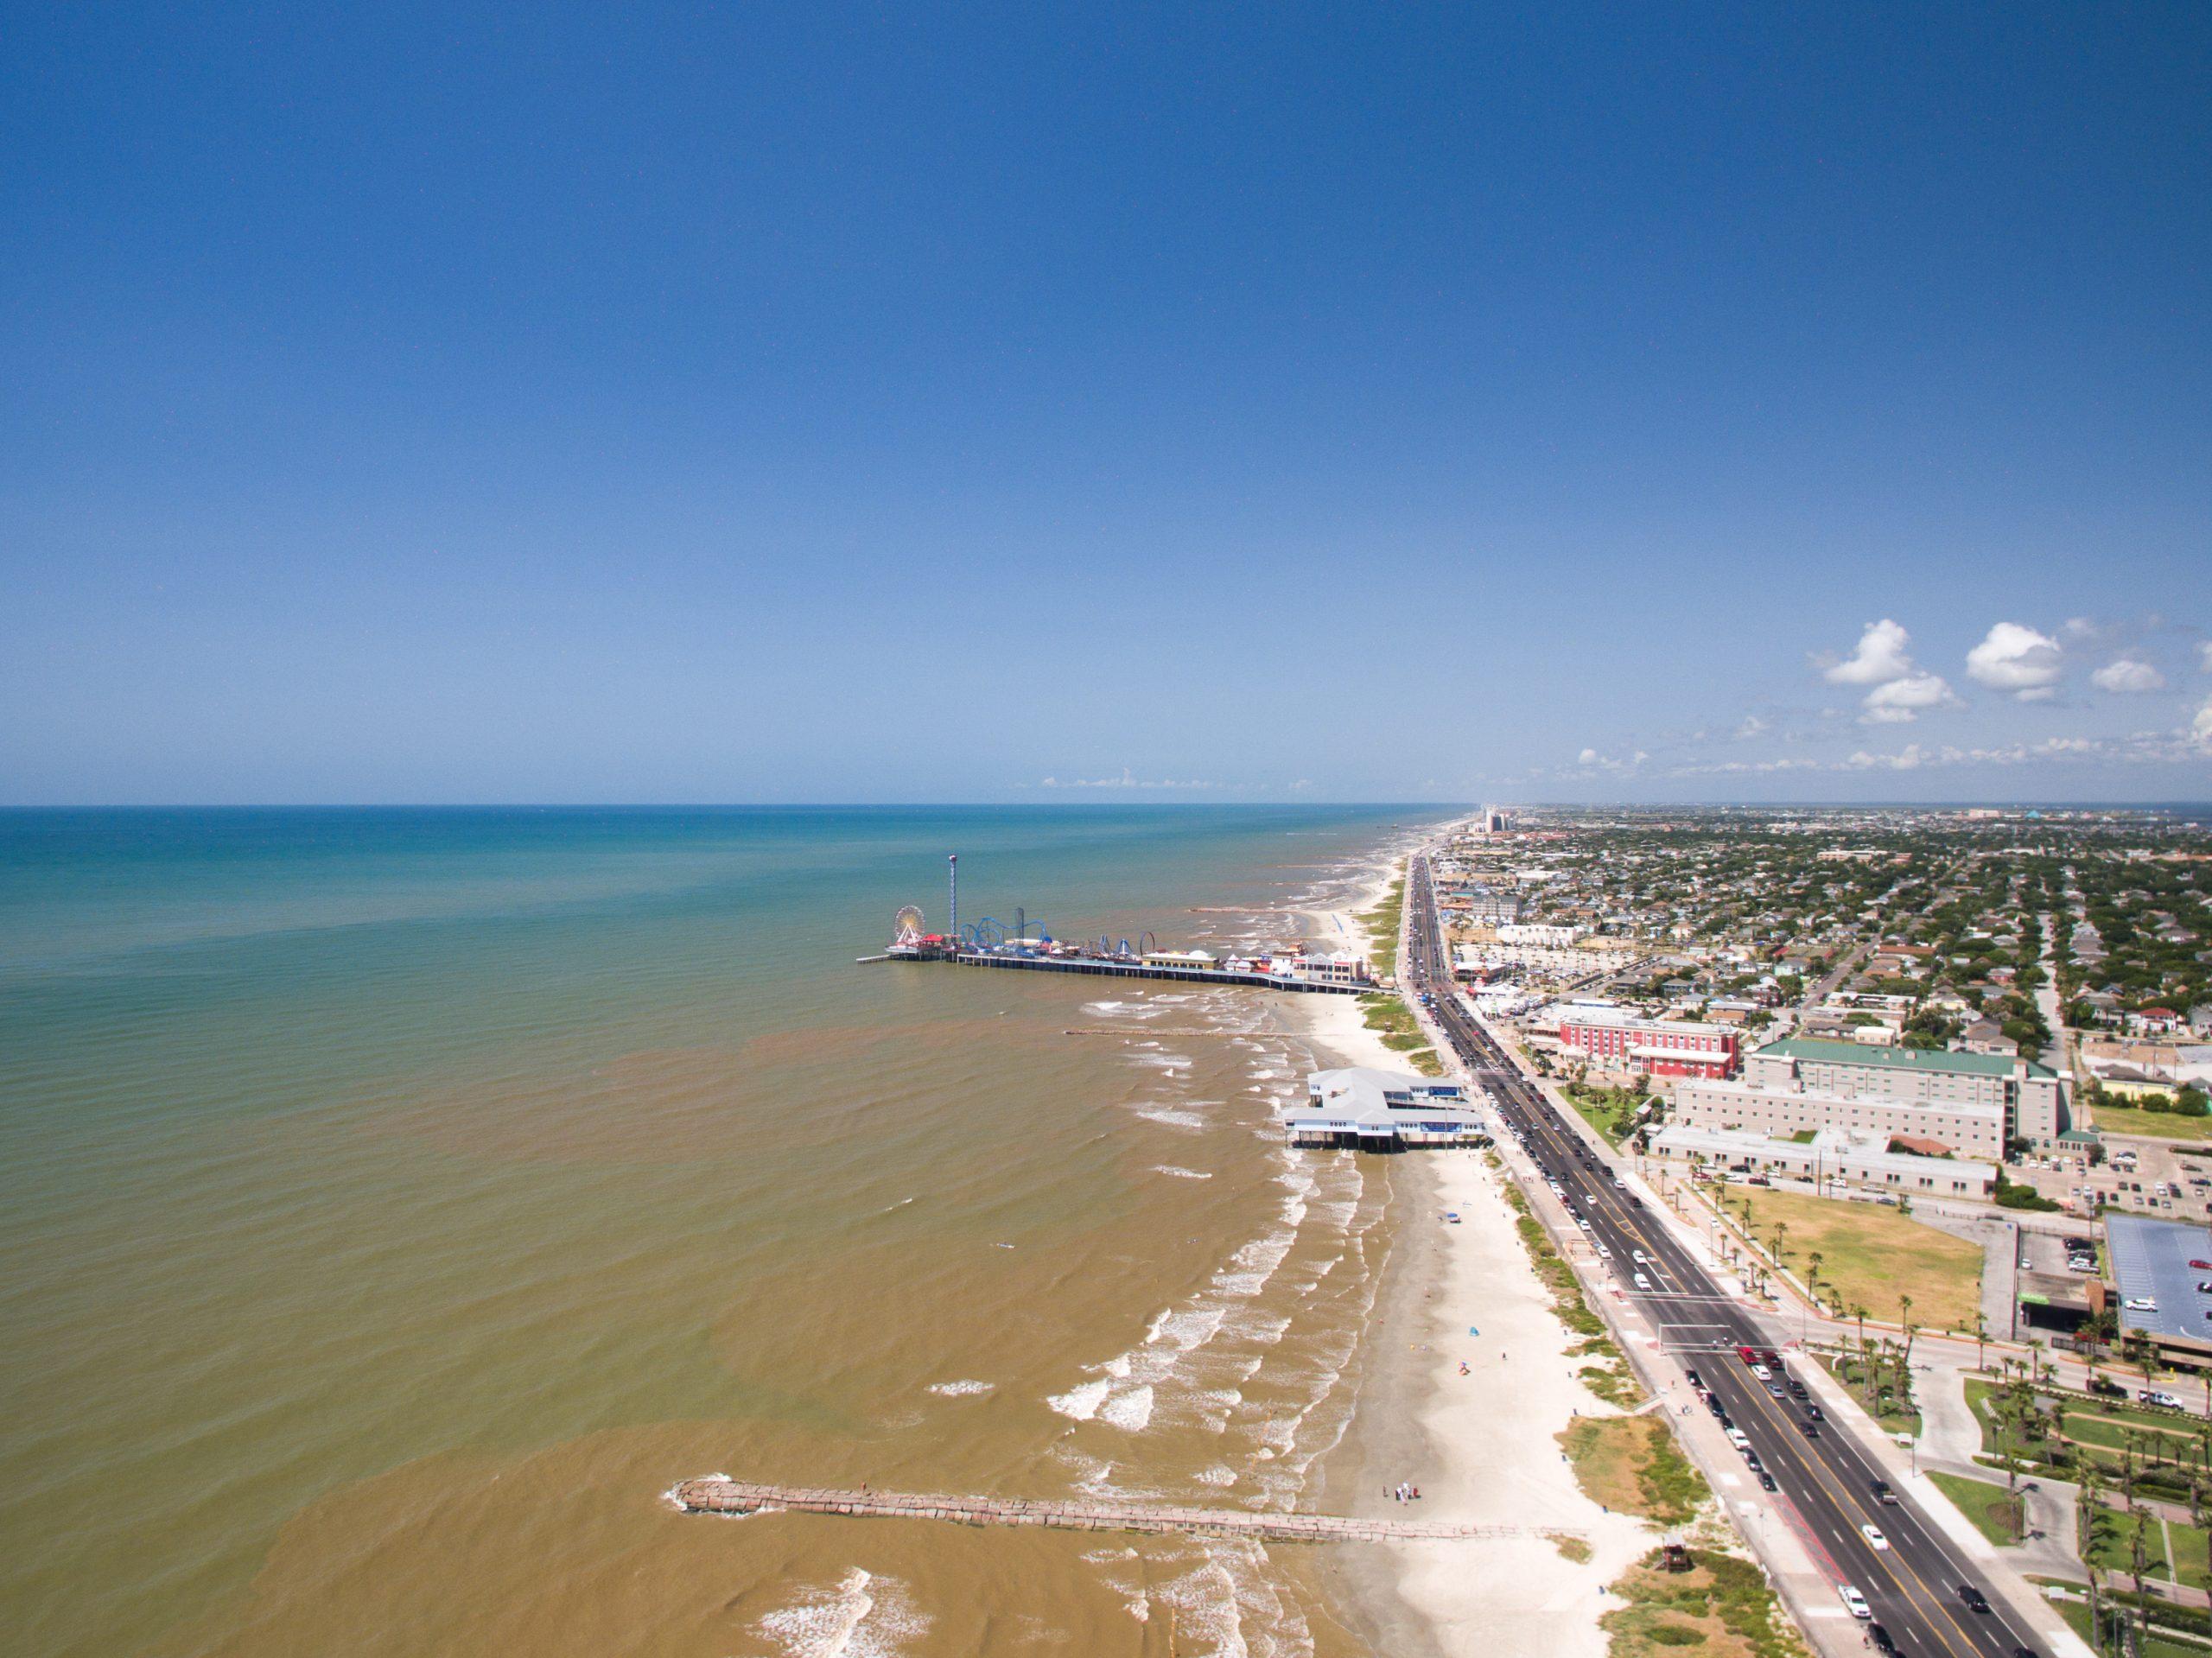 an aerial view of Seawall Boulevard in Galveston